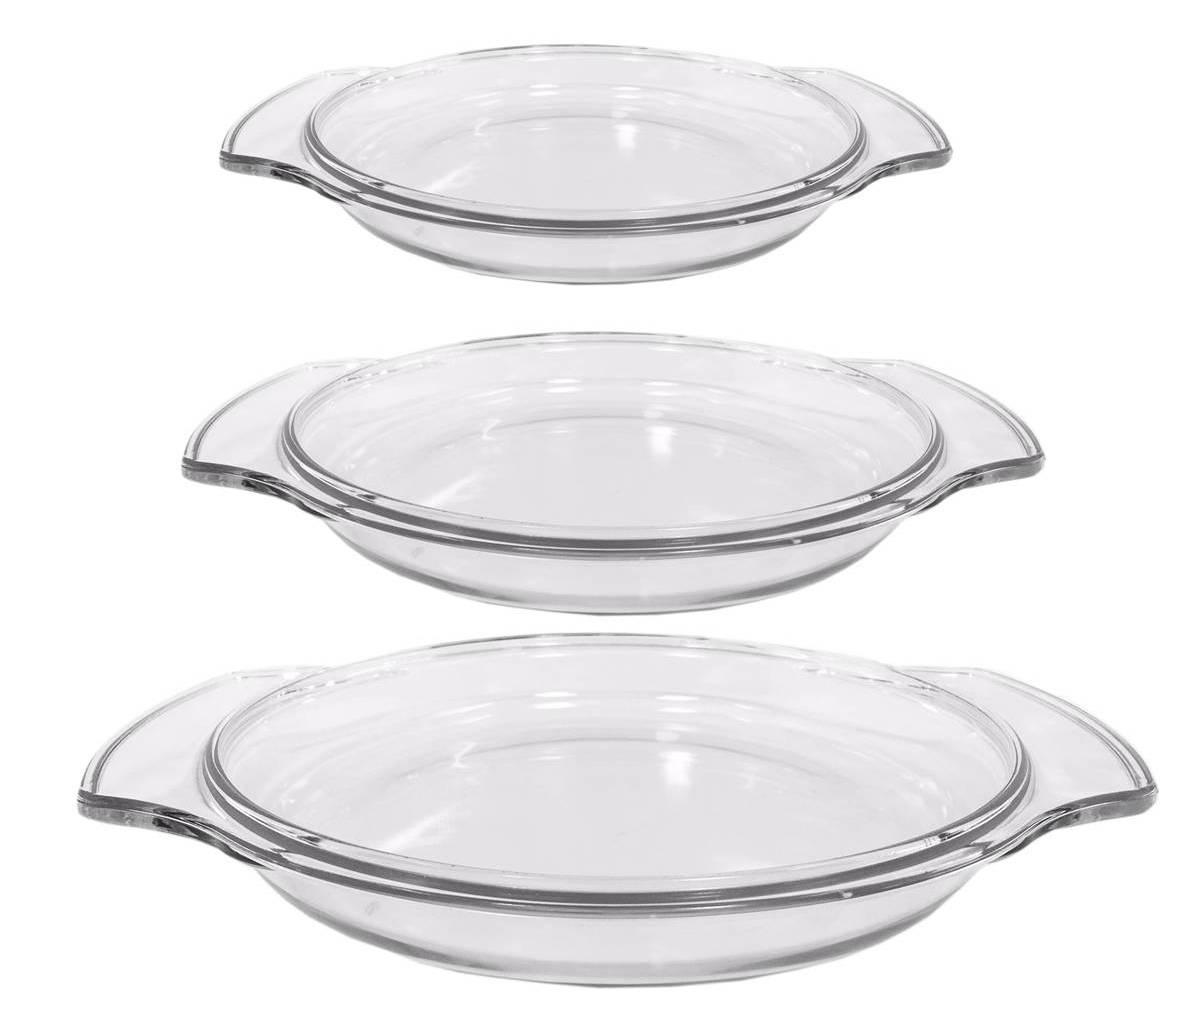 2L Termisil Auflaufformen oval ca 2 Glas